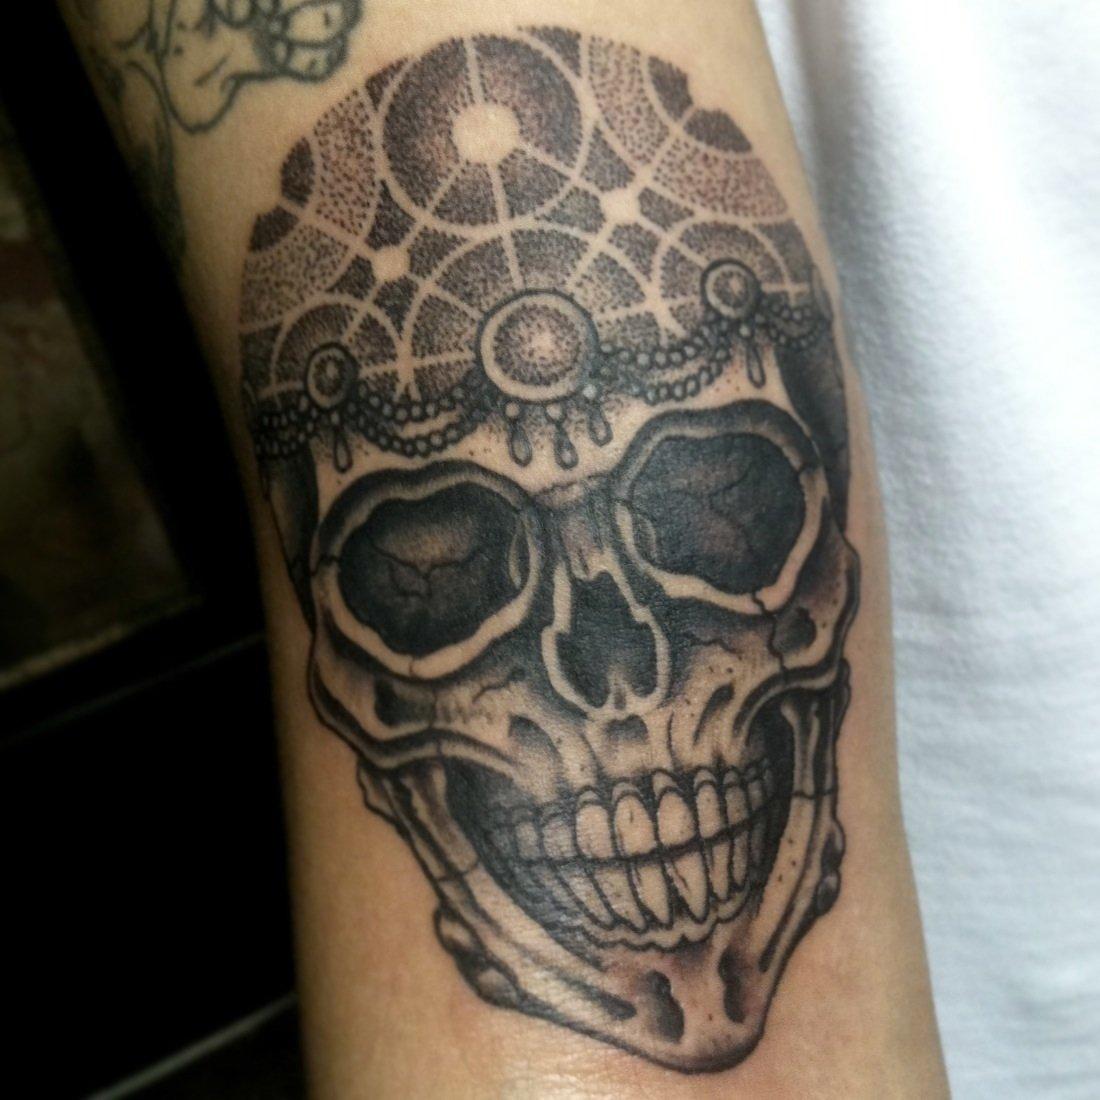 10 Spectacular Skull Tattoo Ideas For Men arm tattoos for men the arts 2021